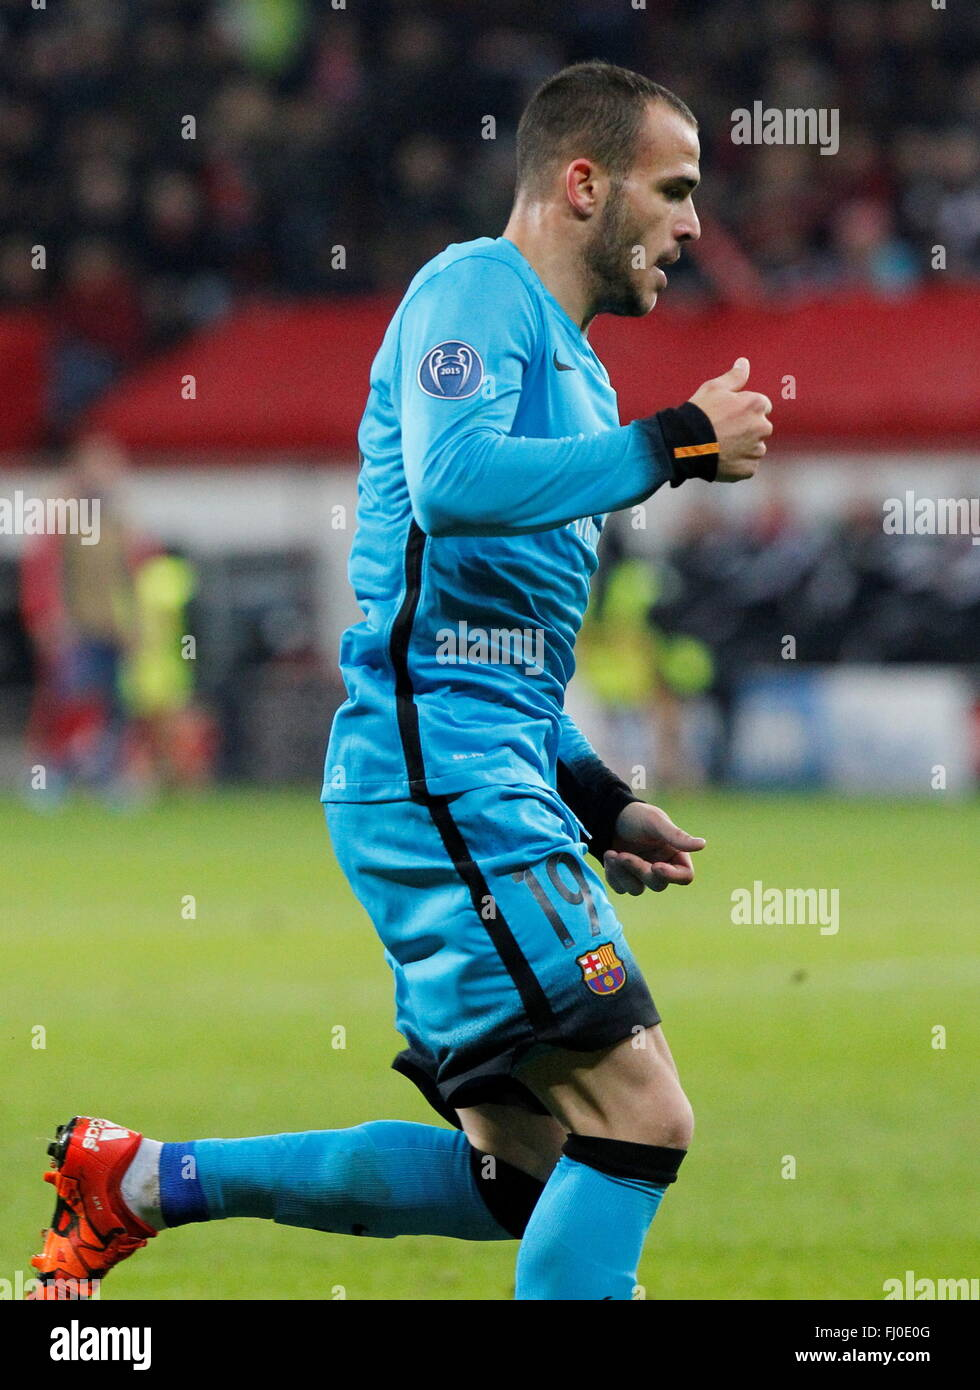 Sandro Ramírez during the champion league match Bayer Leverkusen - FC Barcelona December 9, 2015 in the Bay - Stock Image